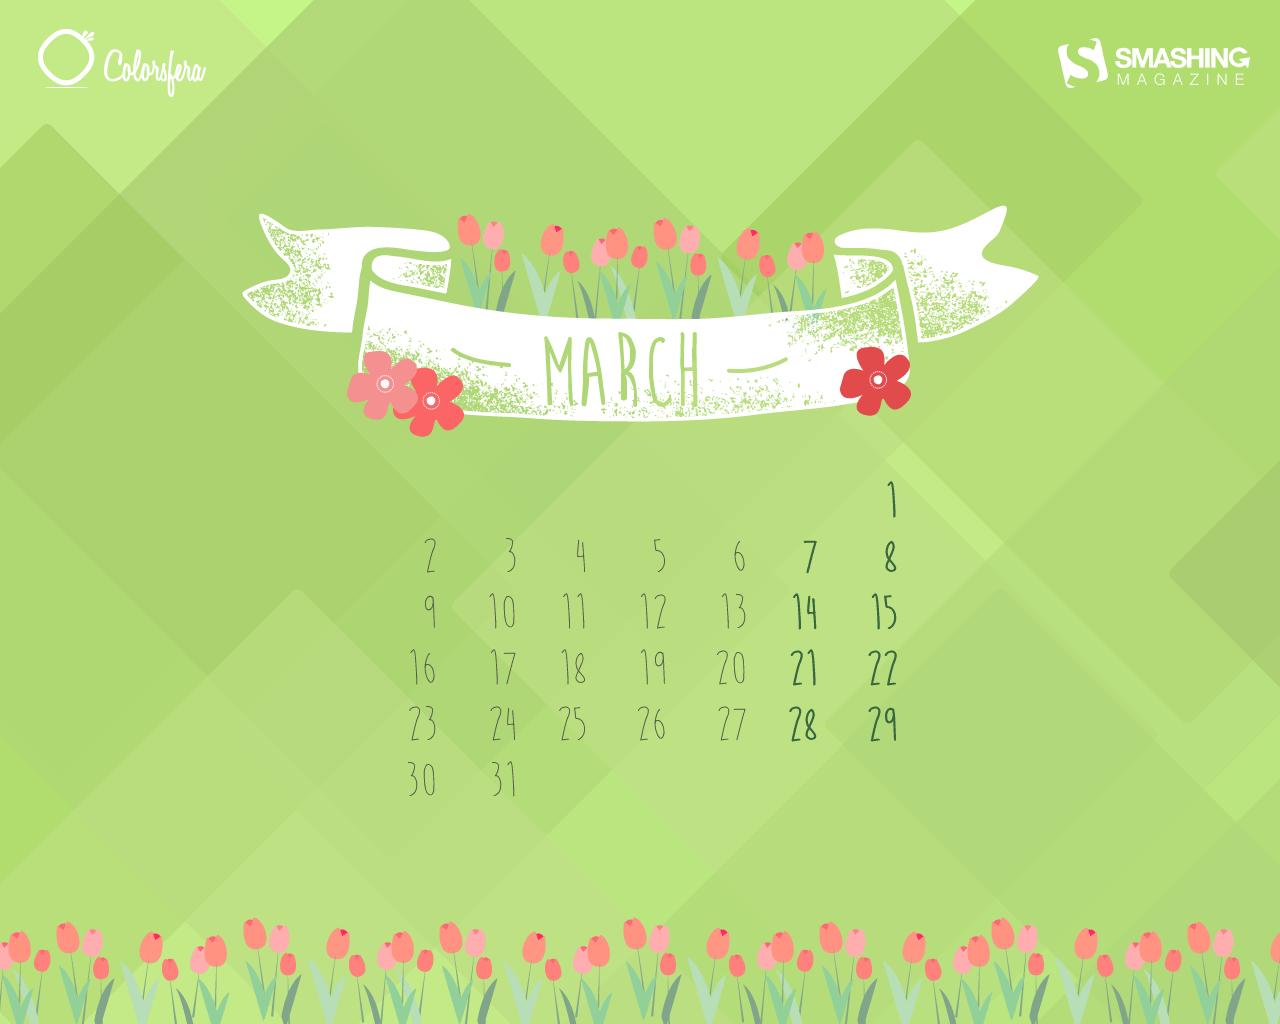 March 2015 wallpaper wallpapersafari - March desktop wallpaper ...